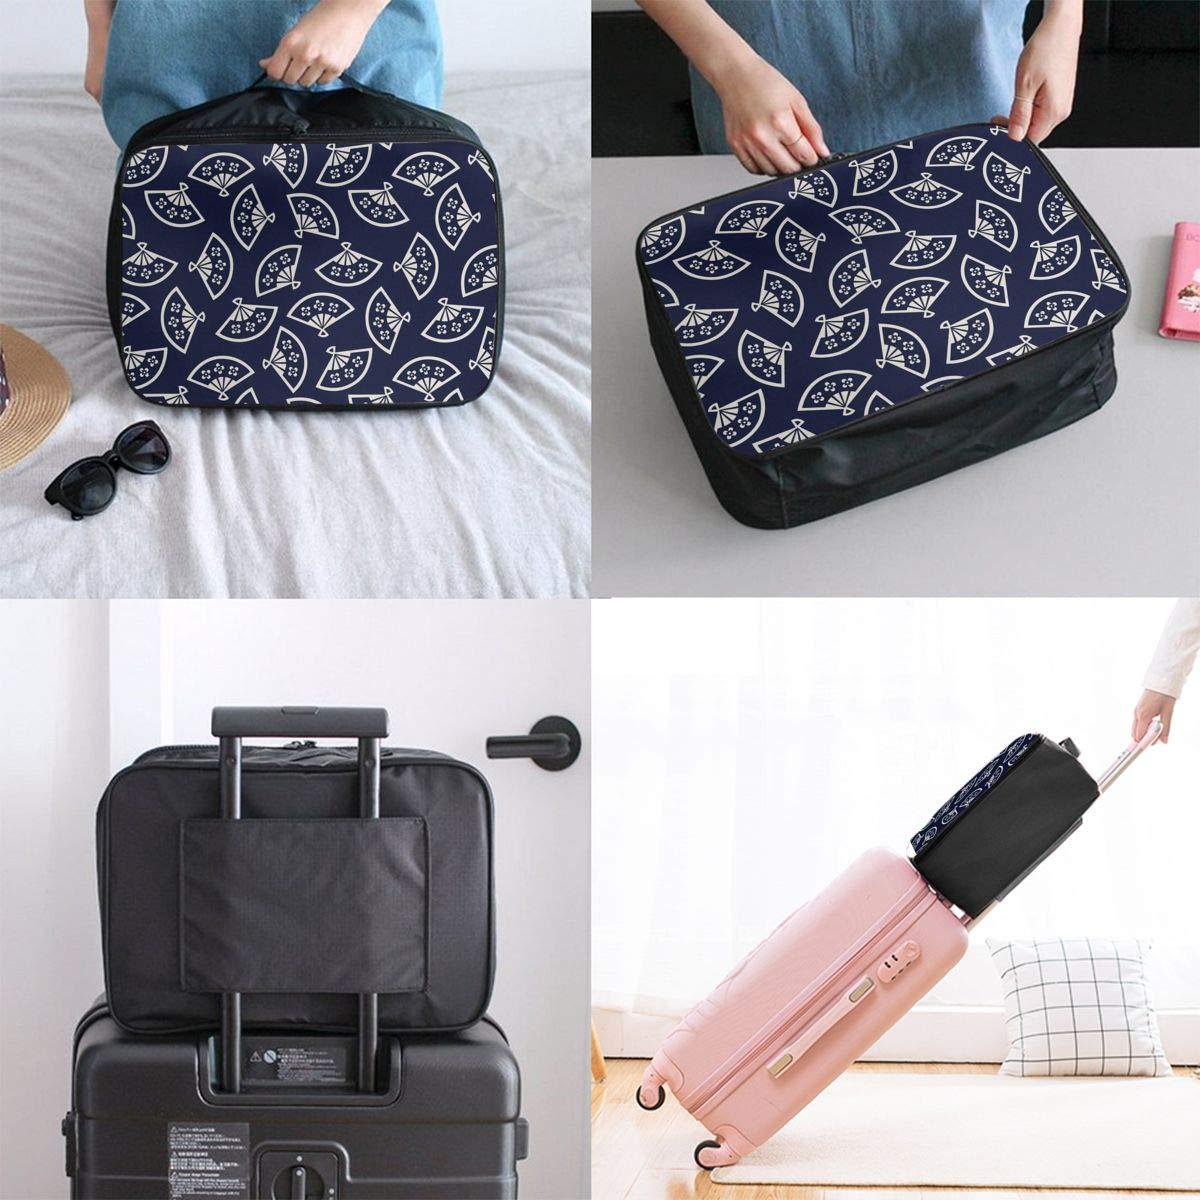 ADGAI Hand Fan Pattern East Asia Canvas Travel Weekender Bag,Fashion Custom Lightweight Large Capacity Portable Luggage Bag,Suitcase Trolley Bag